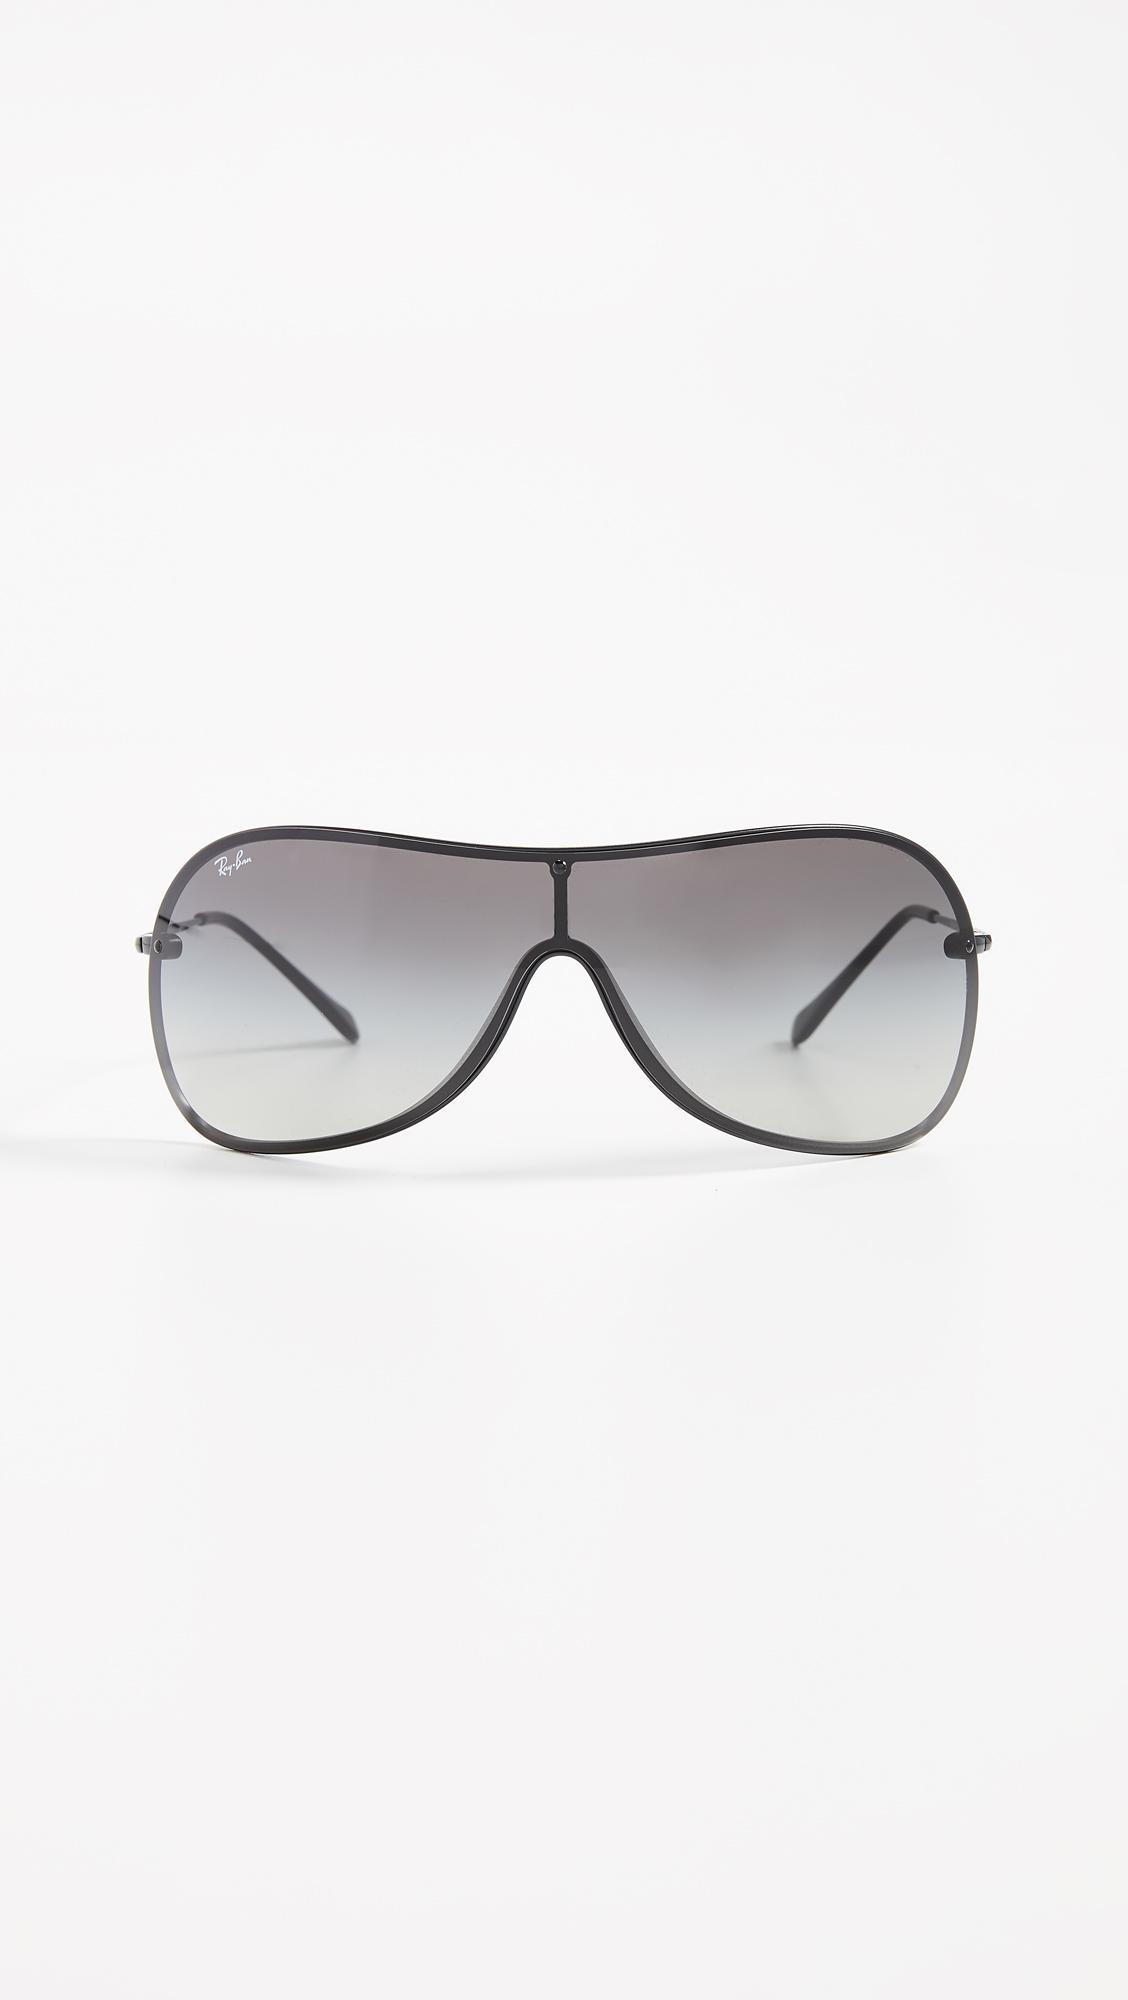 fe9dffd5ba9565 Ray-Ban Shield Sunglasses in Black - Lyst